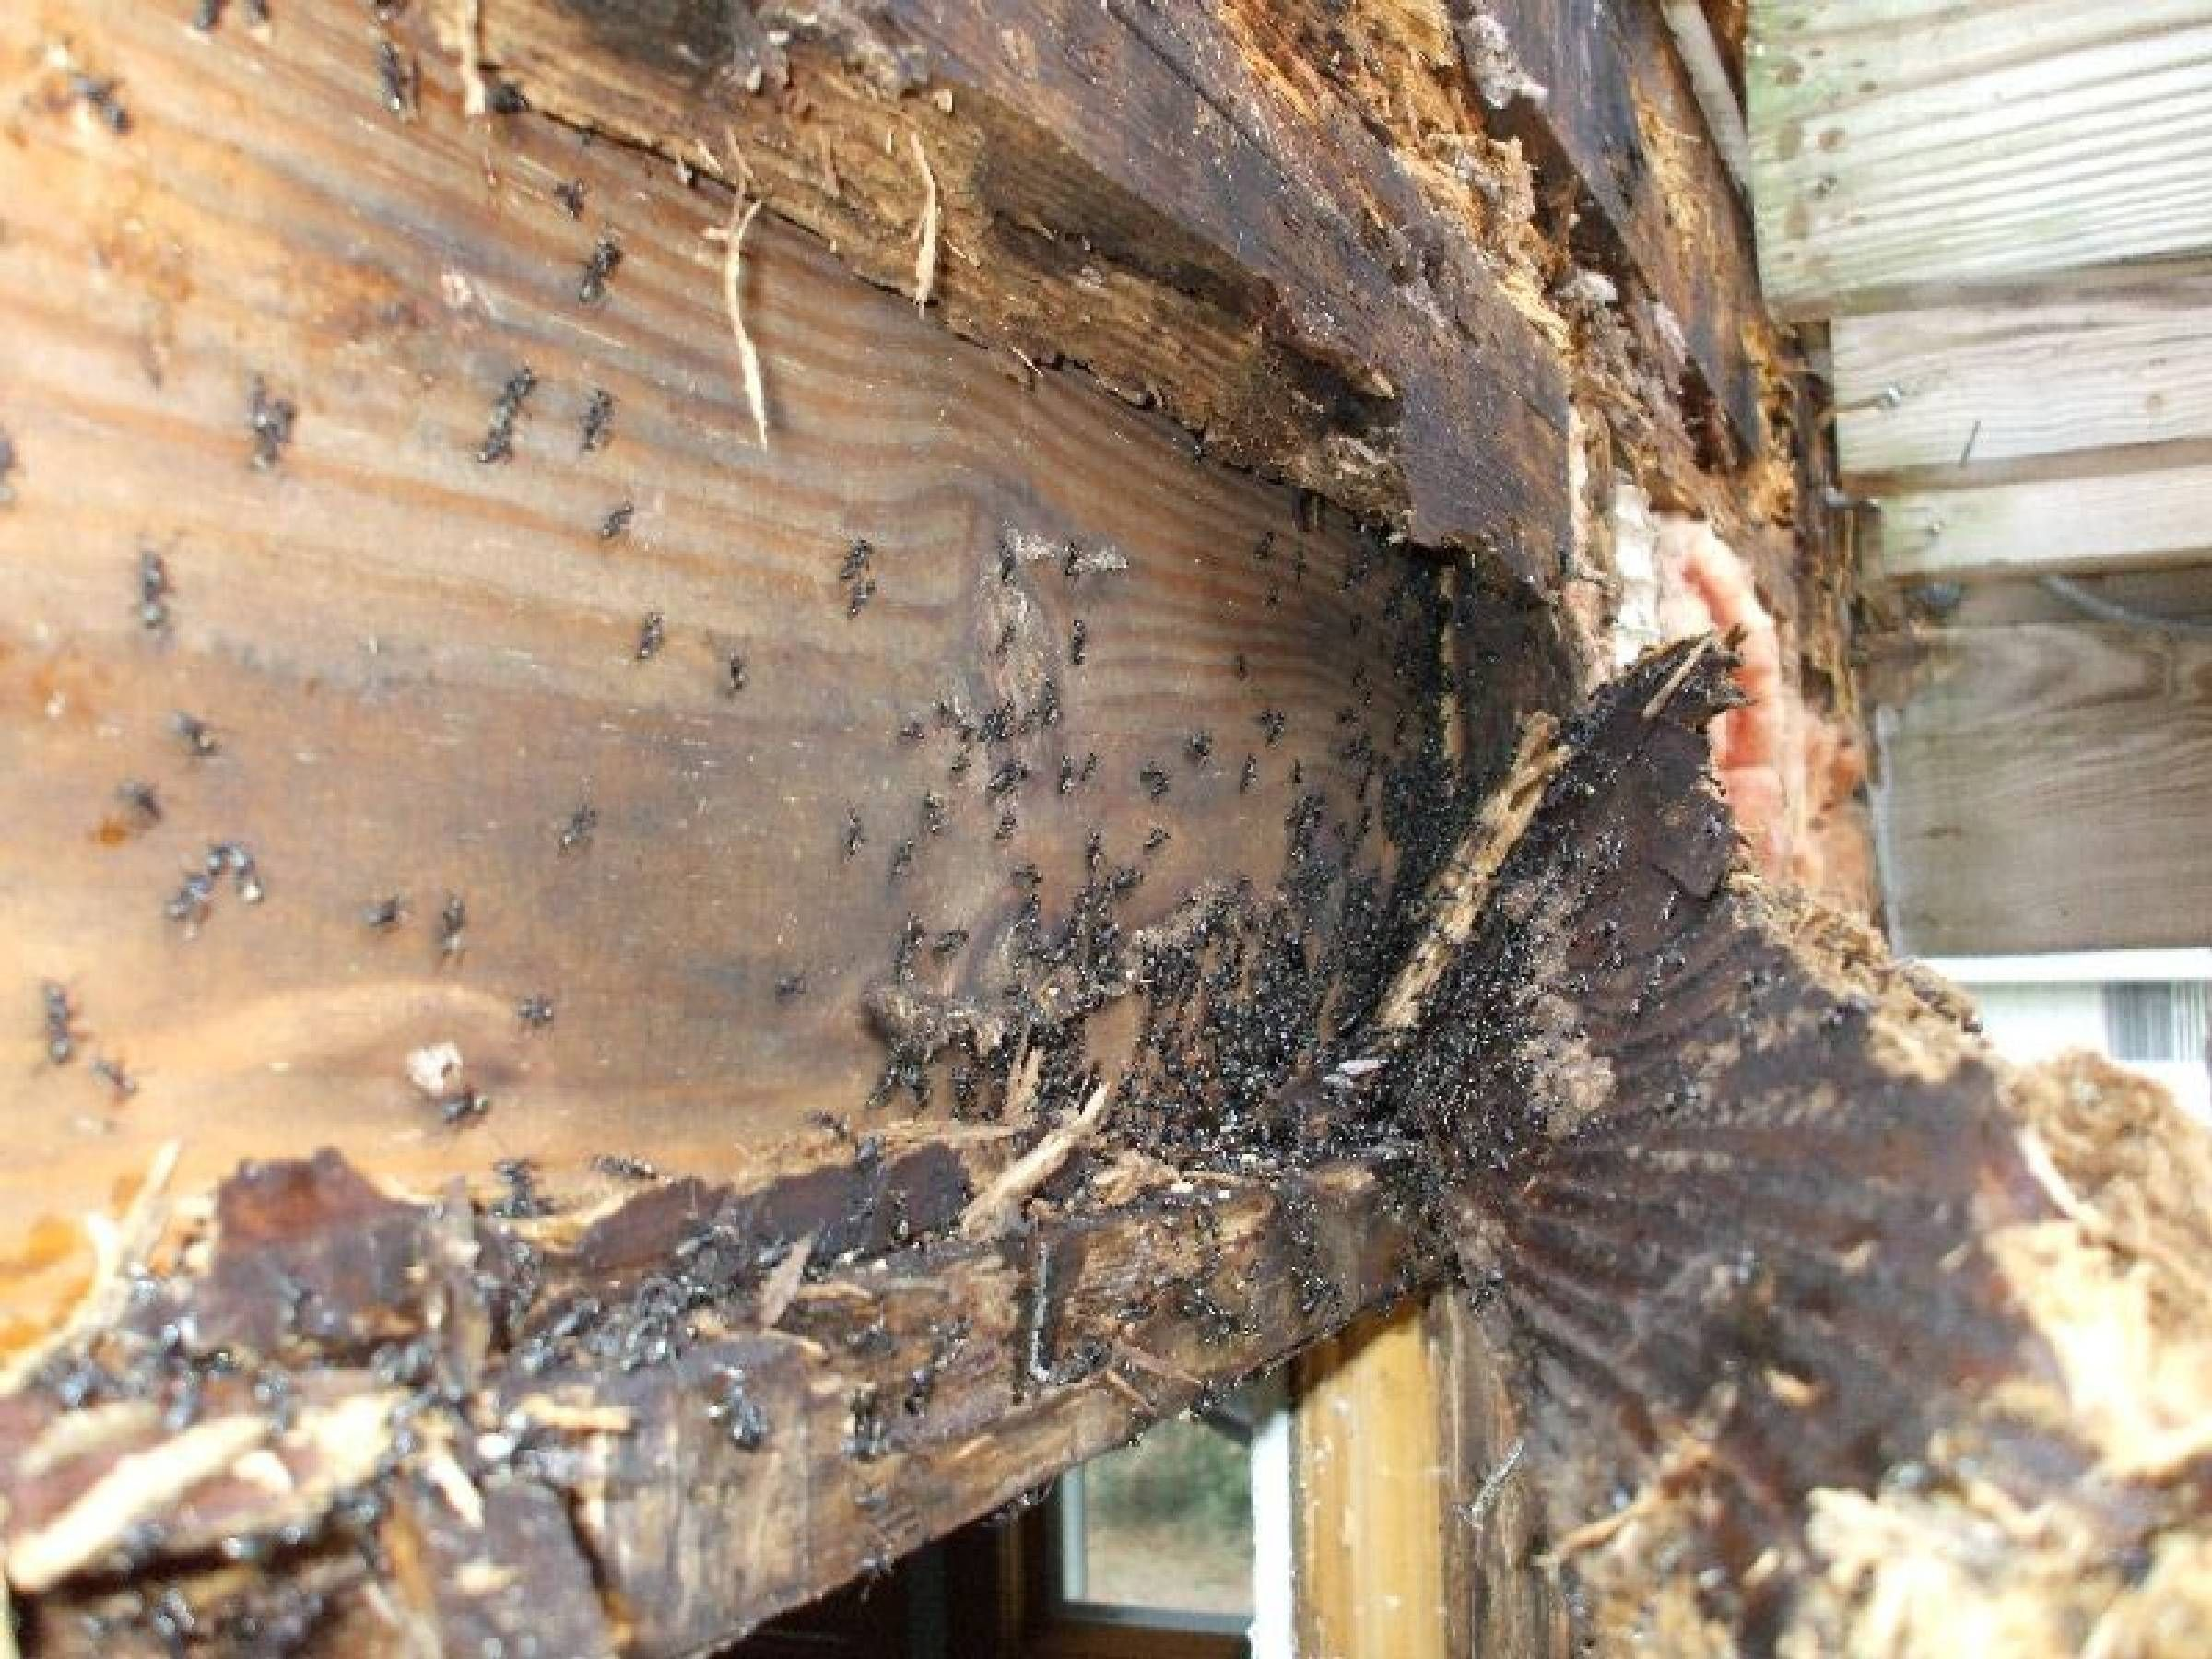 The Termite Bond And Repair Termite Damage Services Near Me Termite Damage Termites Termite Bond